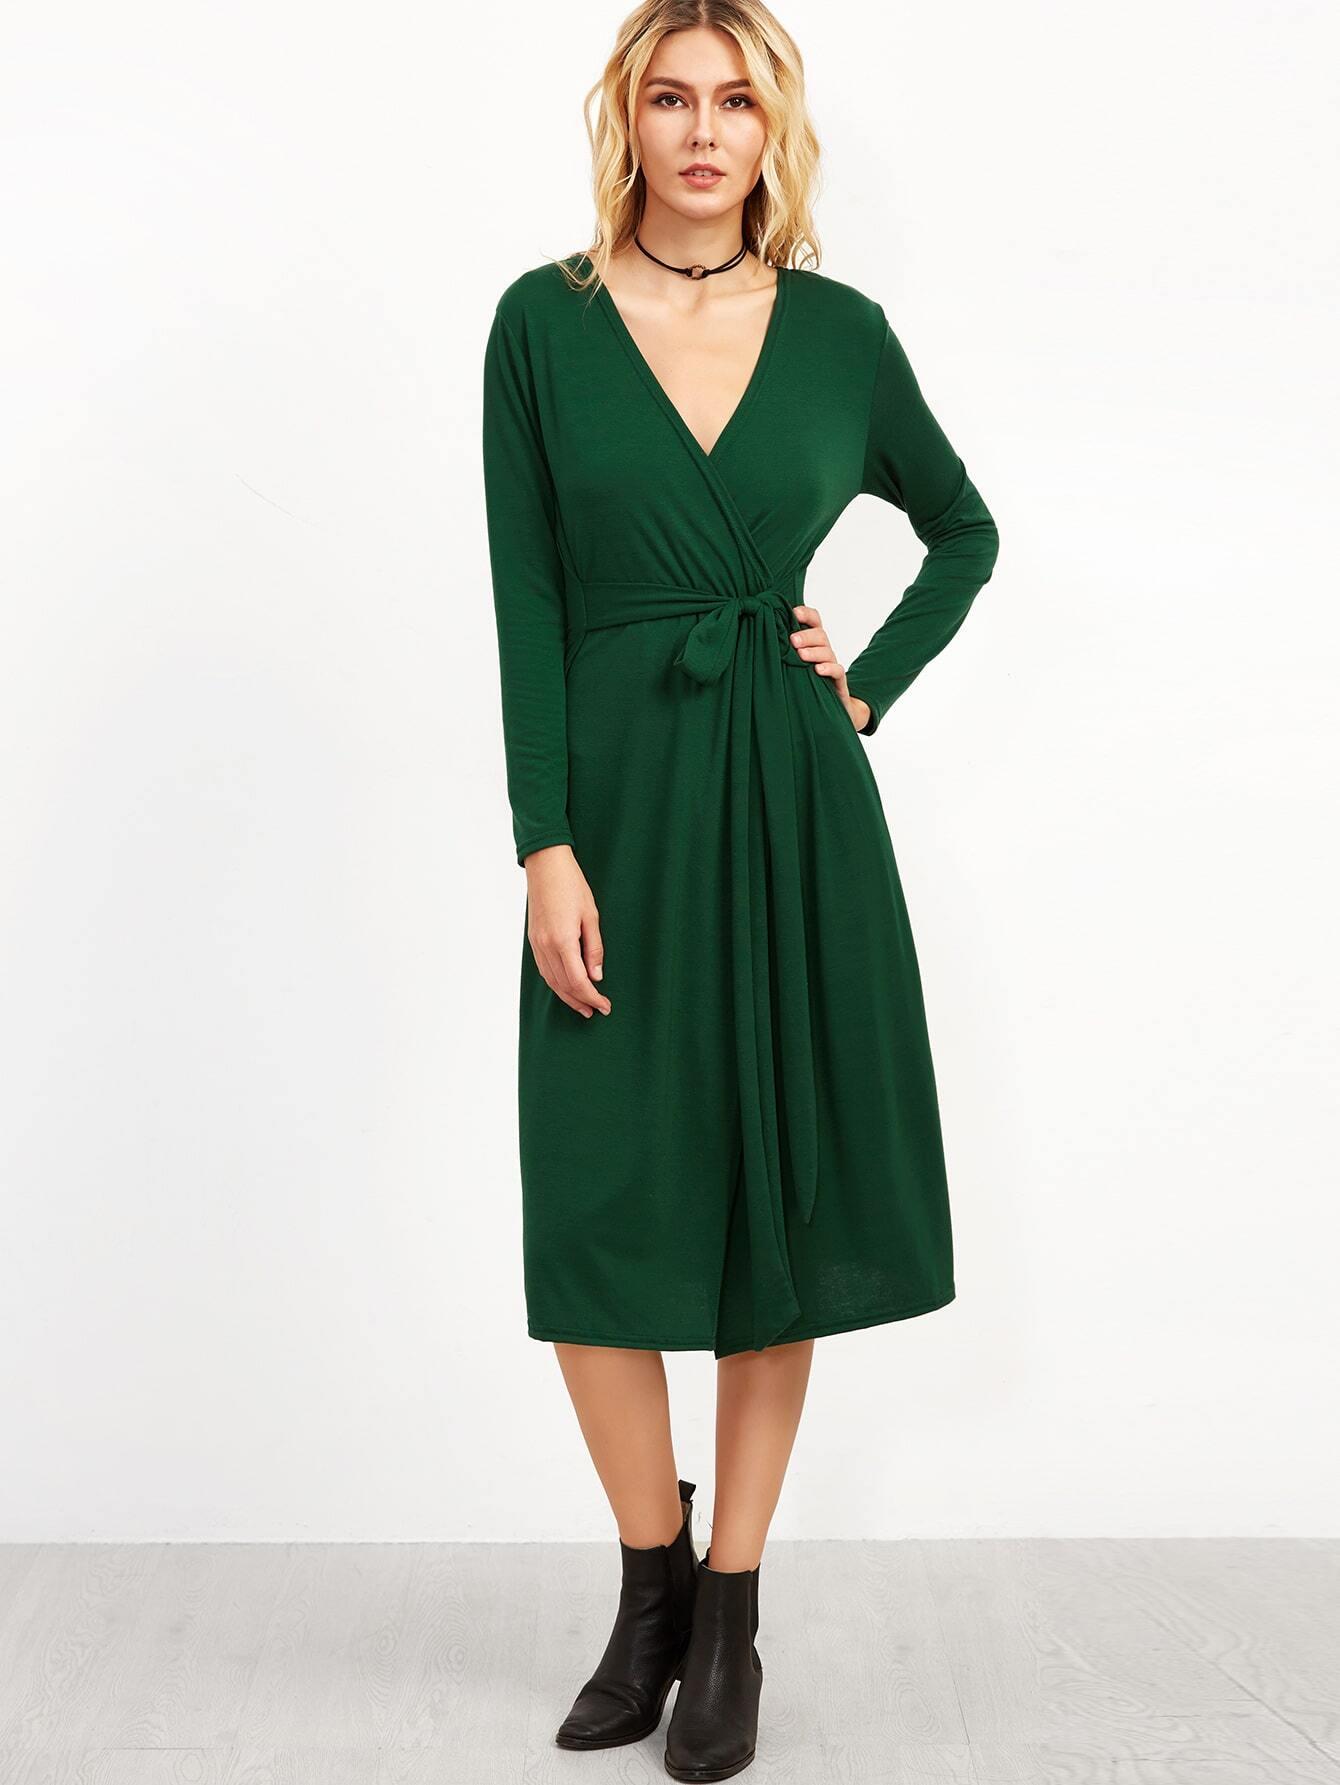 81730ed92c3 Dark Green Deep V Neck Wrap Dress EmmaCloth-Women Fast Fashion Online